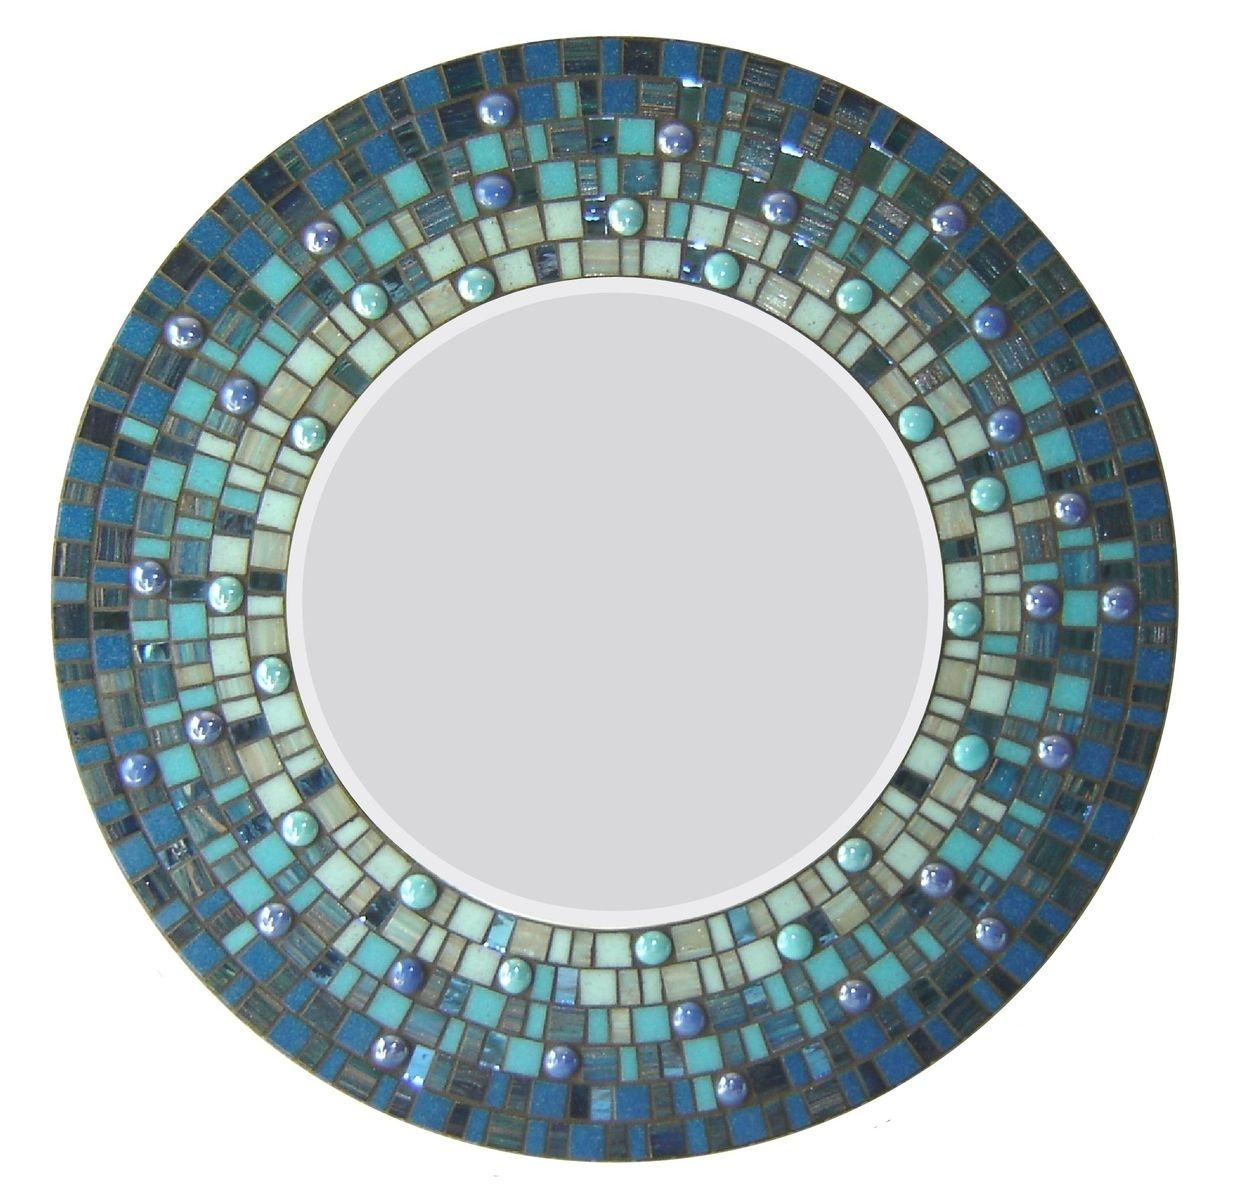 Mosaic Wall Mirror Round